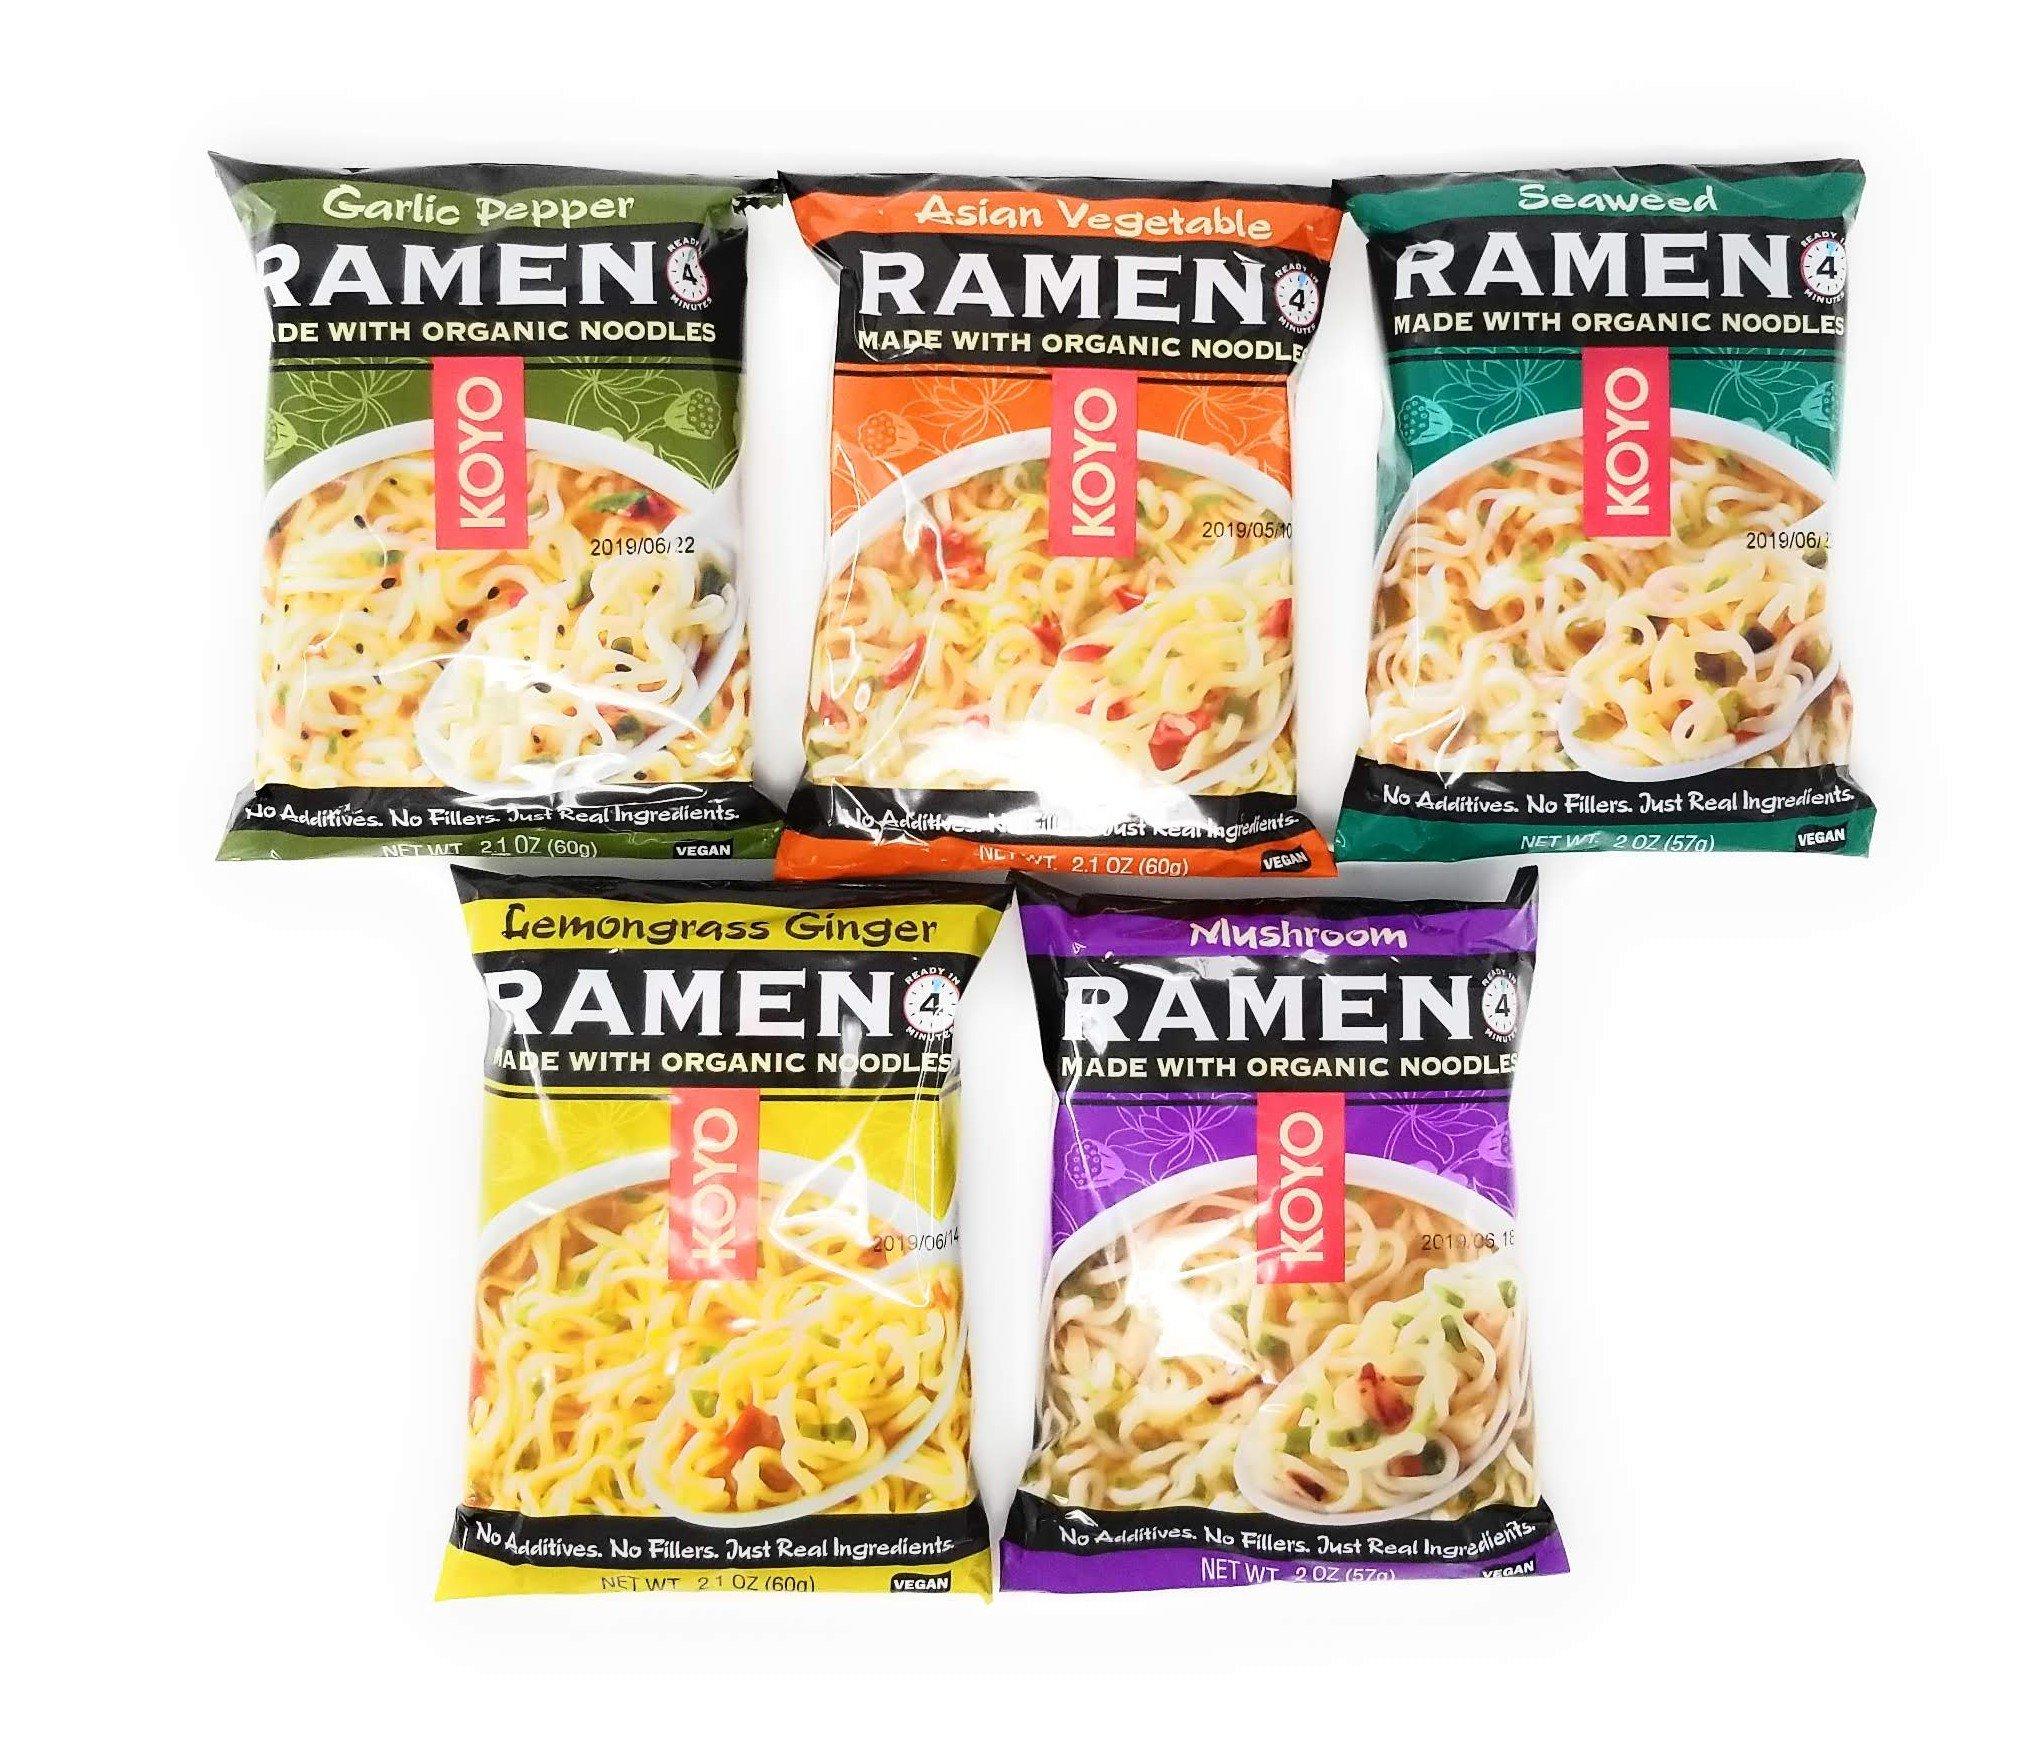 Koyo Ramen Variety Bundle - Made with Organic Noodles - Vegan Meal - Asian Cuisine - 10 Pack - 2 Of Each (Mushroom, Seaweed, Tofu Miso, Garlic Pepper, Lemongrass Ginger) In Anytime Sunshine Box